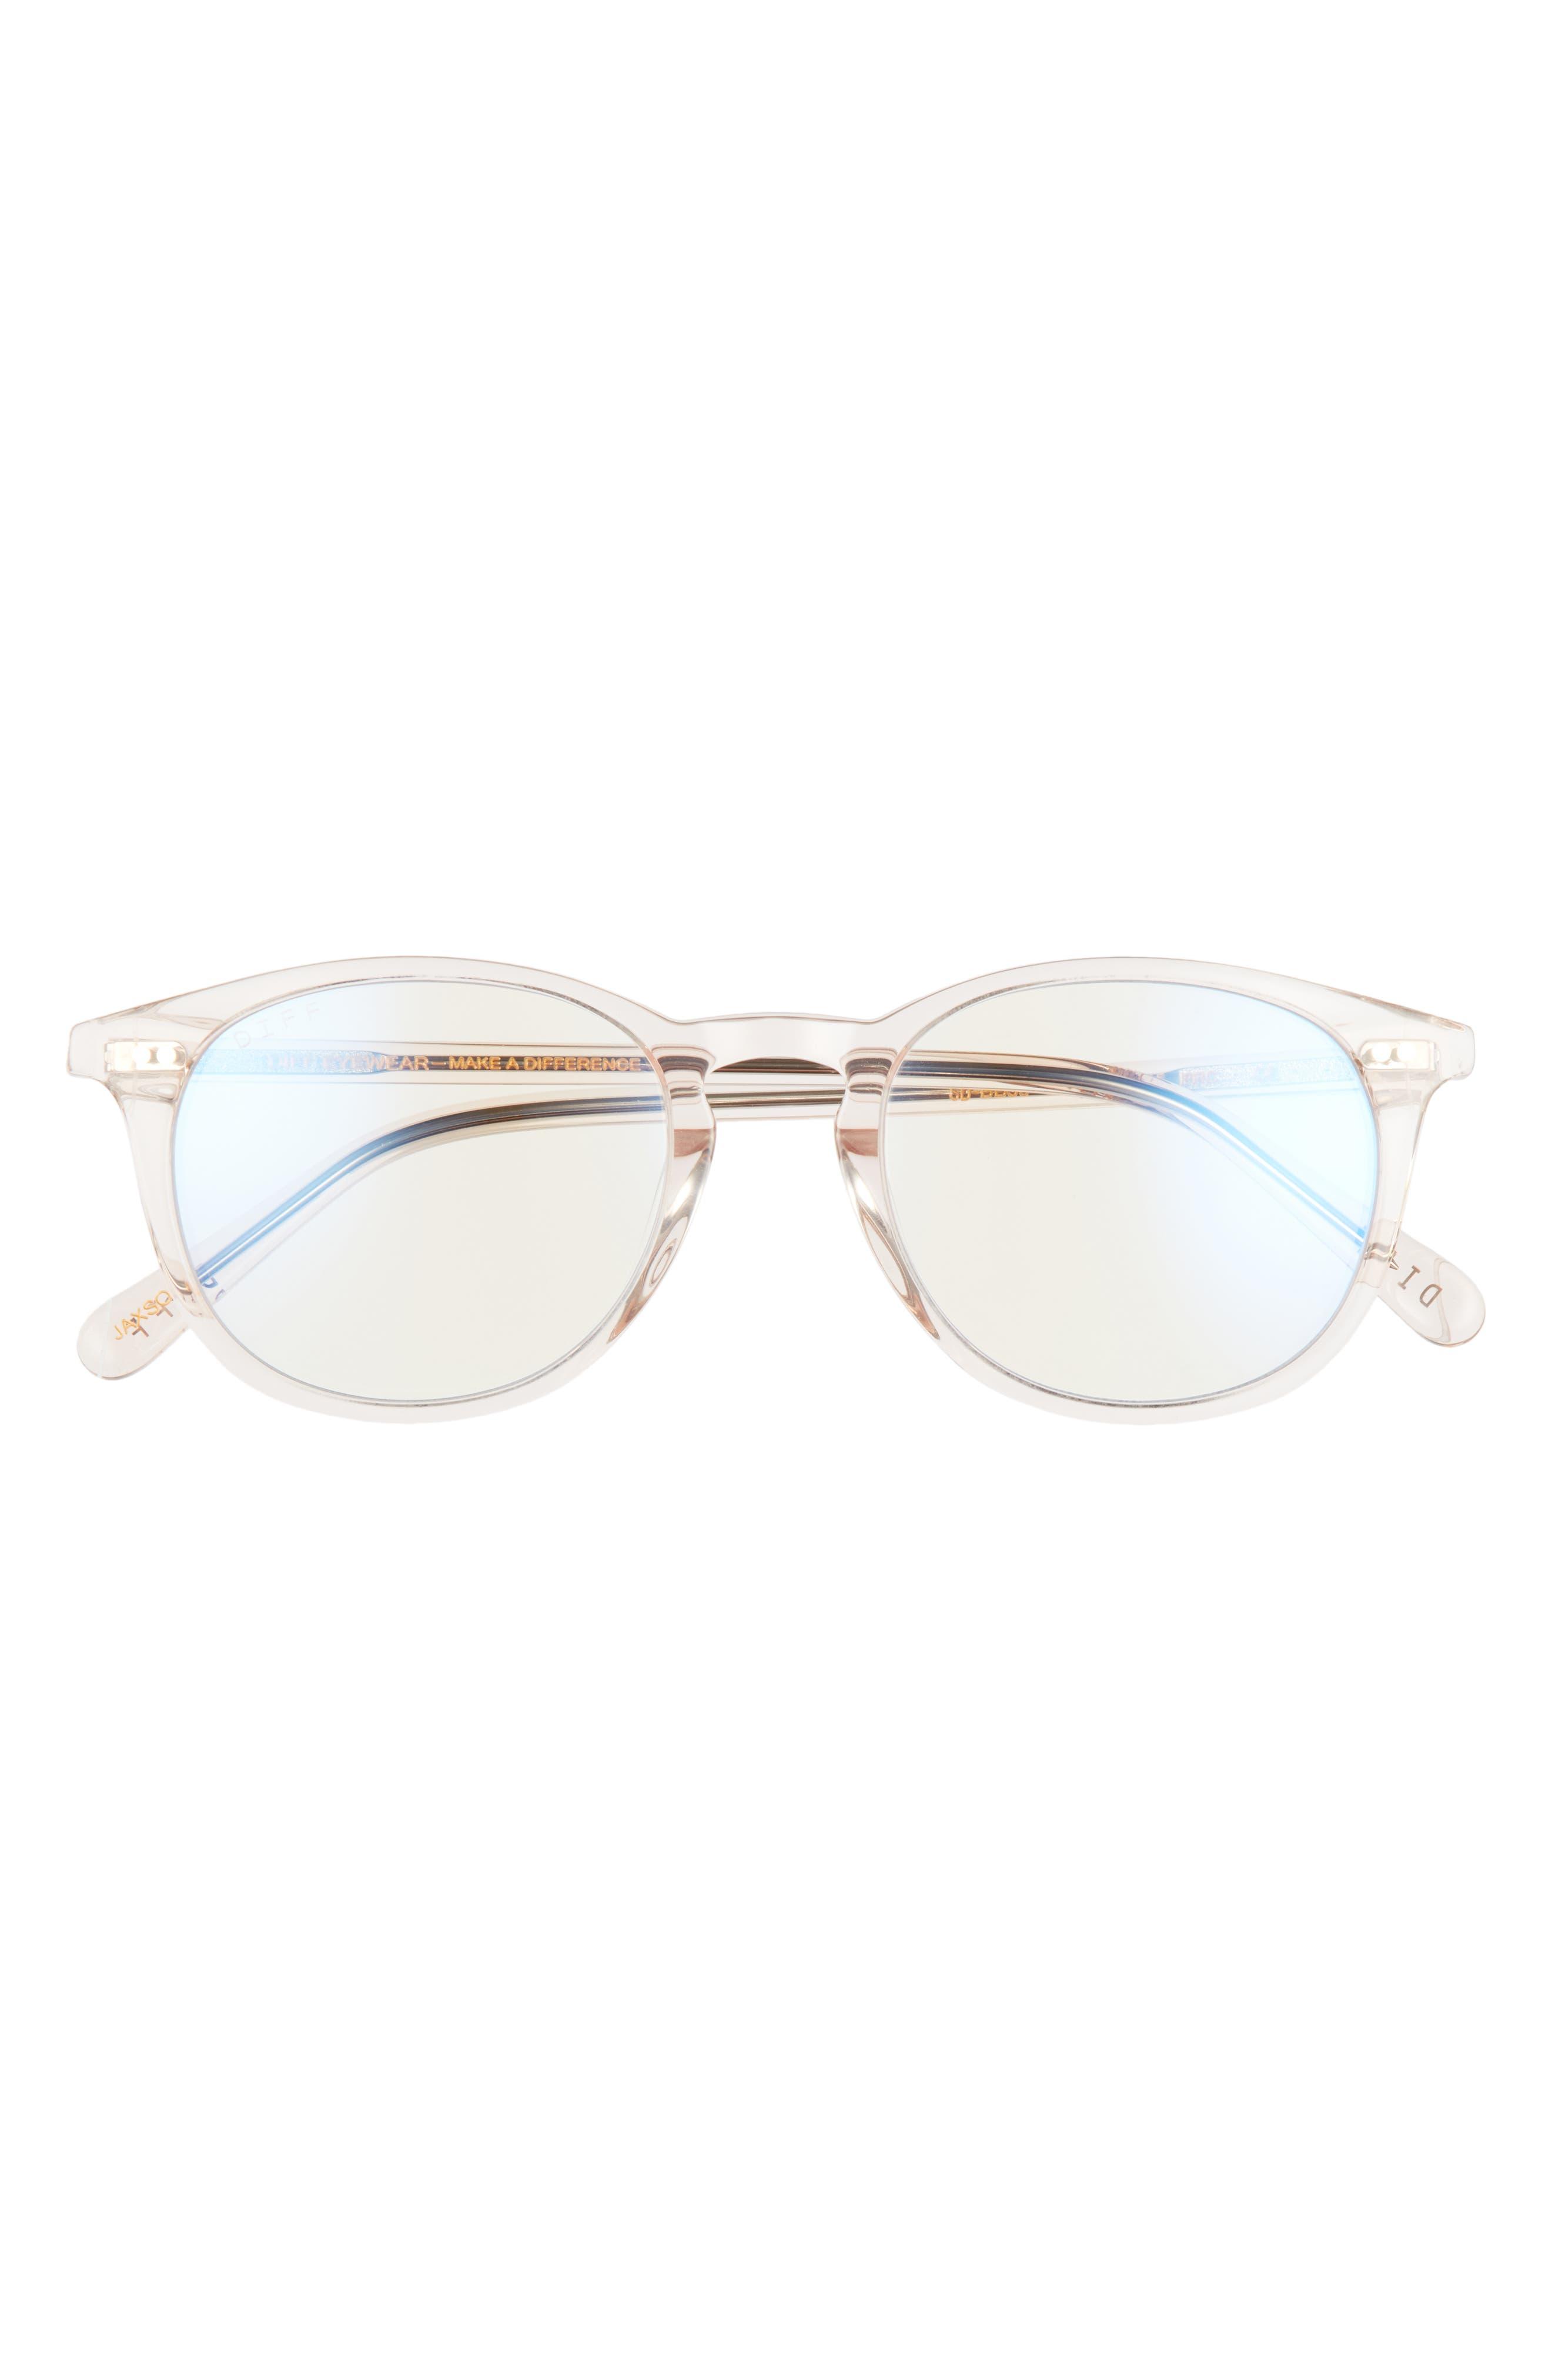 Jaxson 49mm Blue Light Blocking Glasses